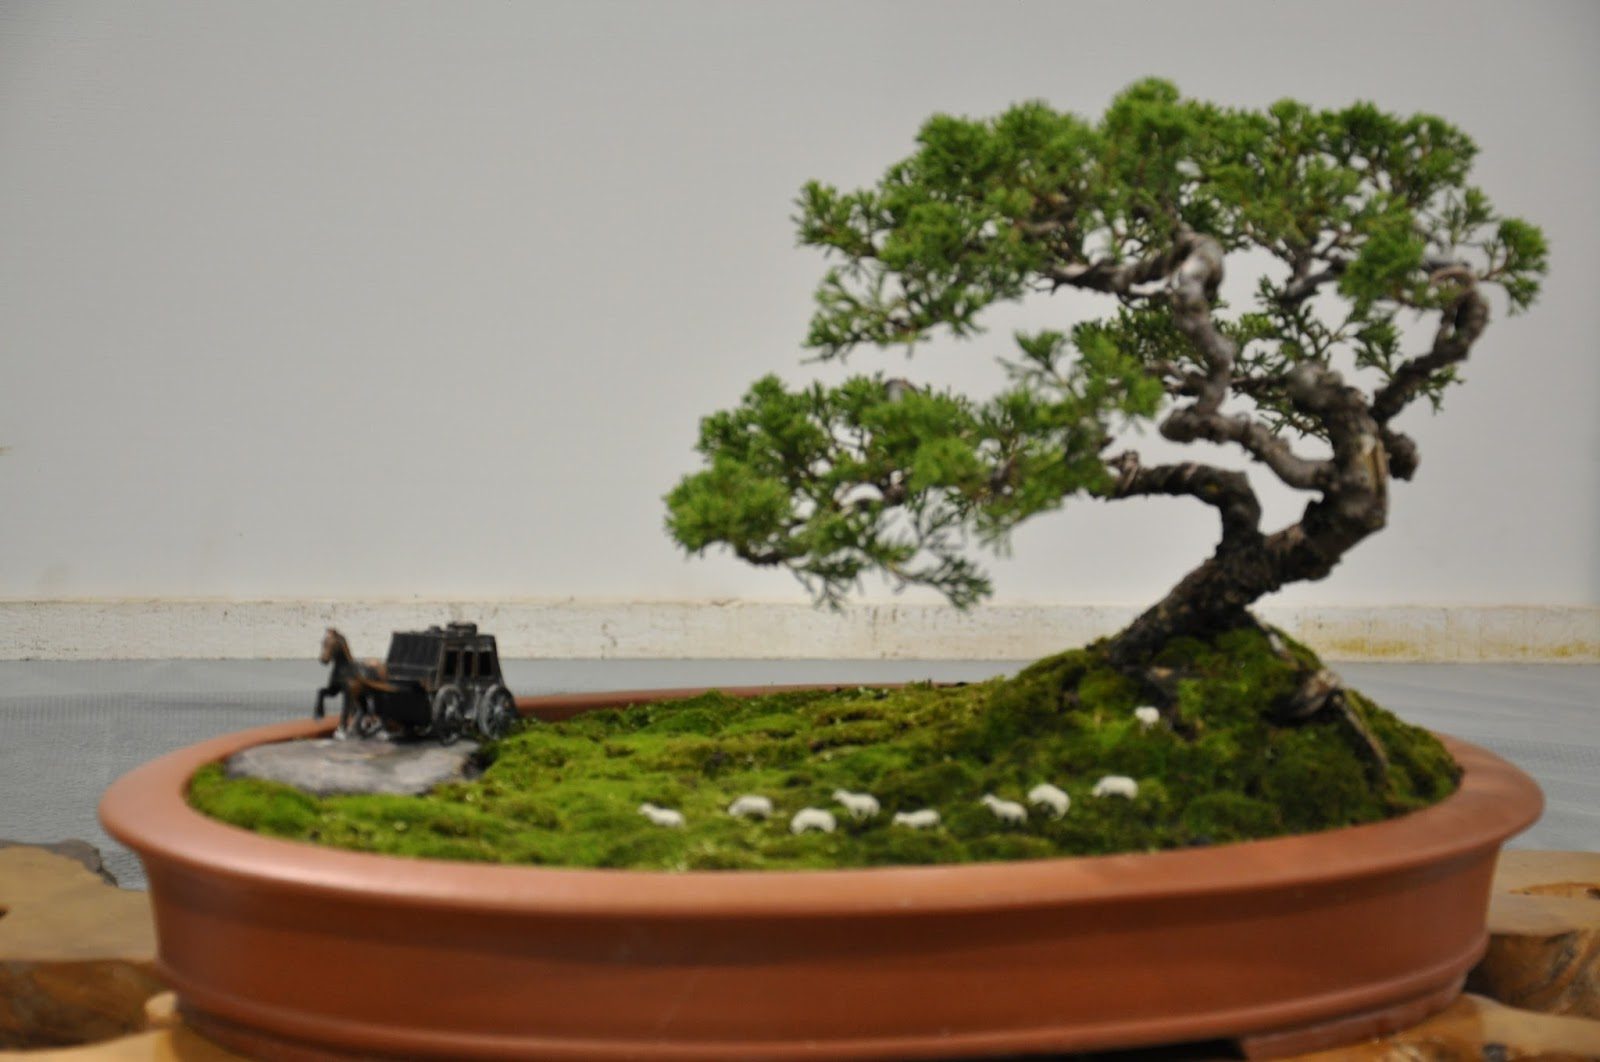 All In One Bonsai And Ceramics Taiwan Bonsai Exhibitions